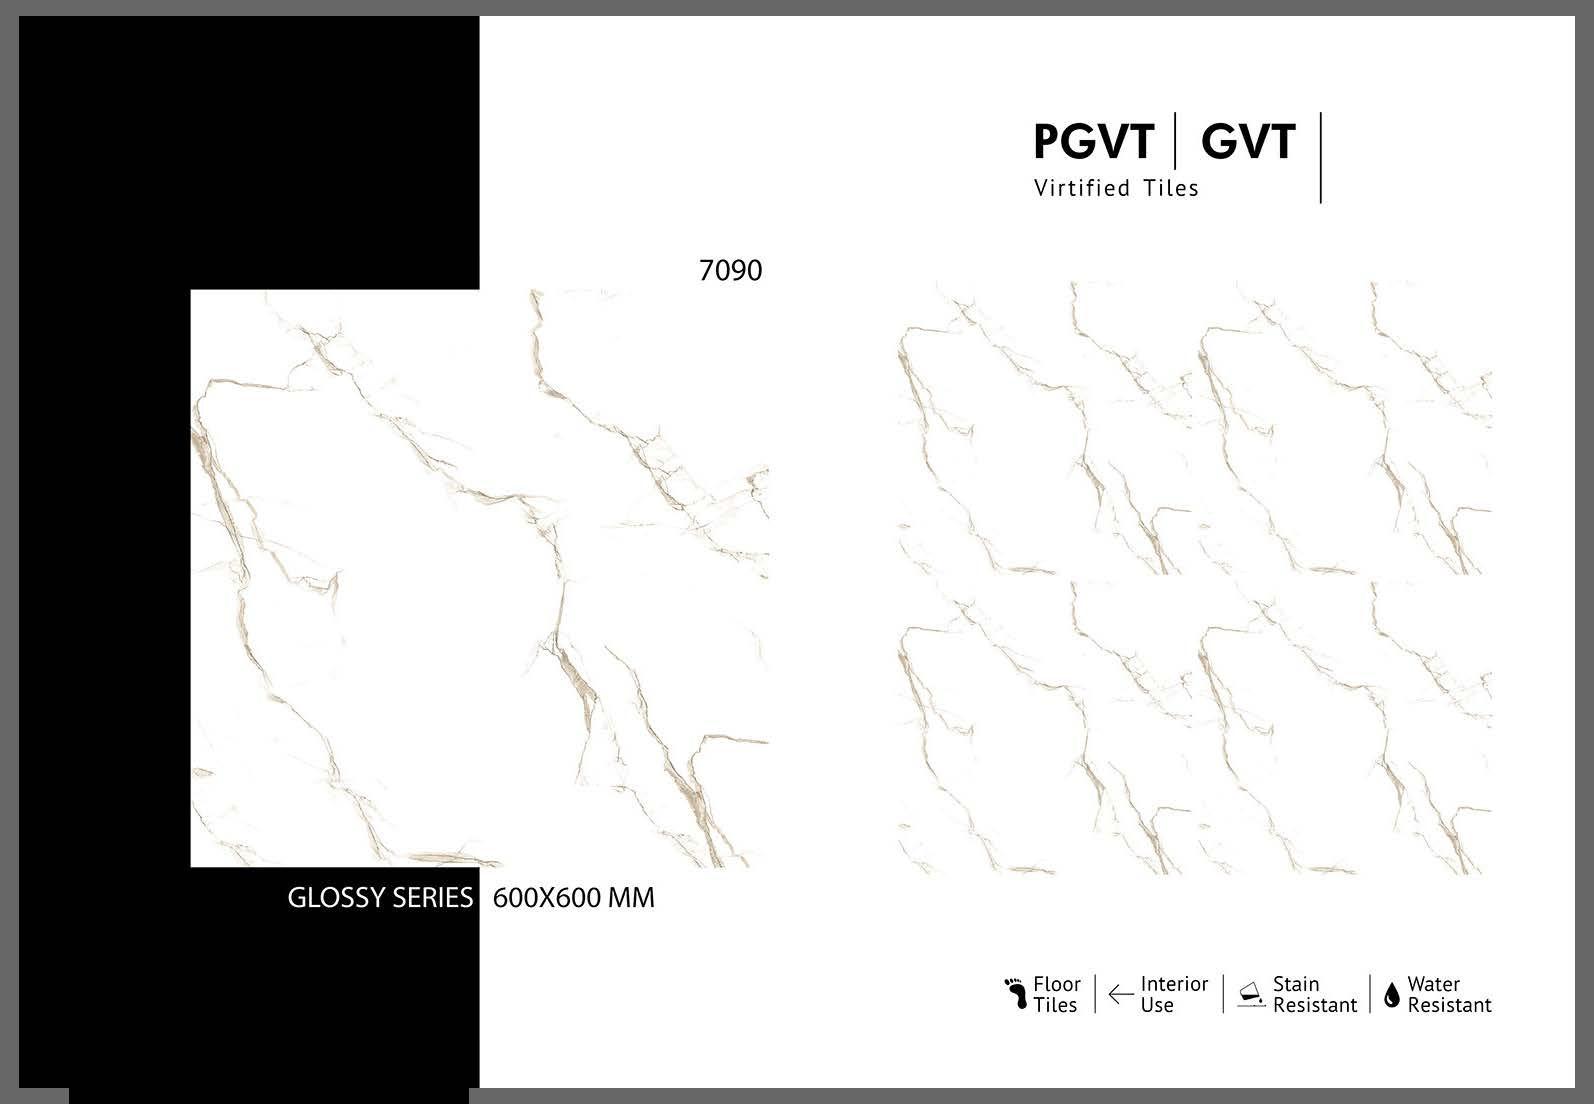 GVT 2X2 GLOSSY_Page_77.jpg